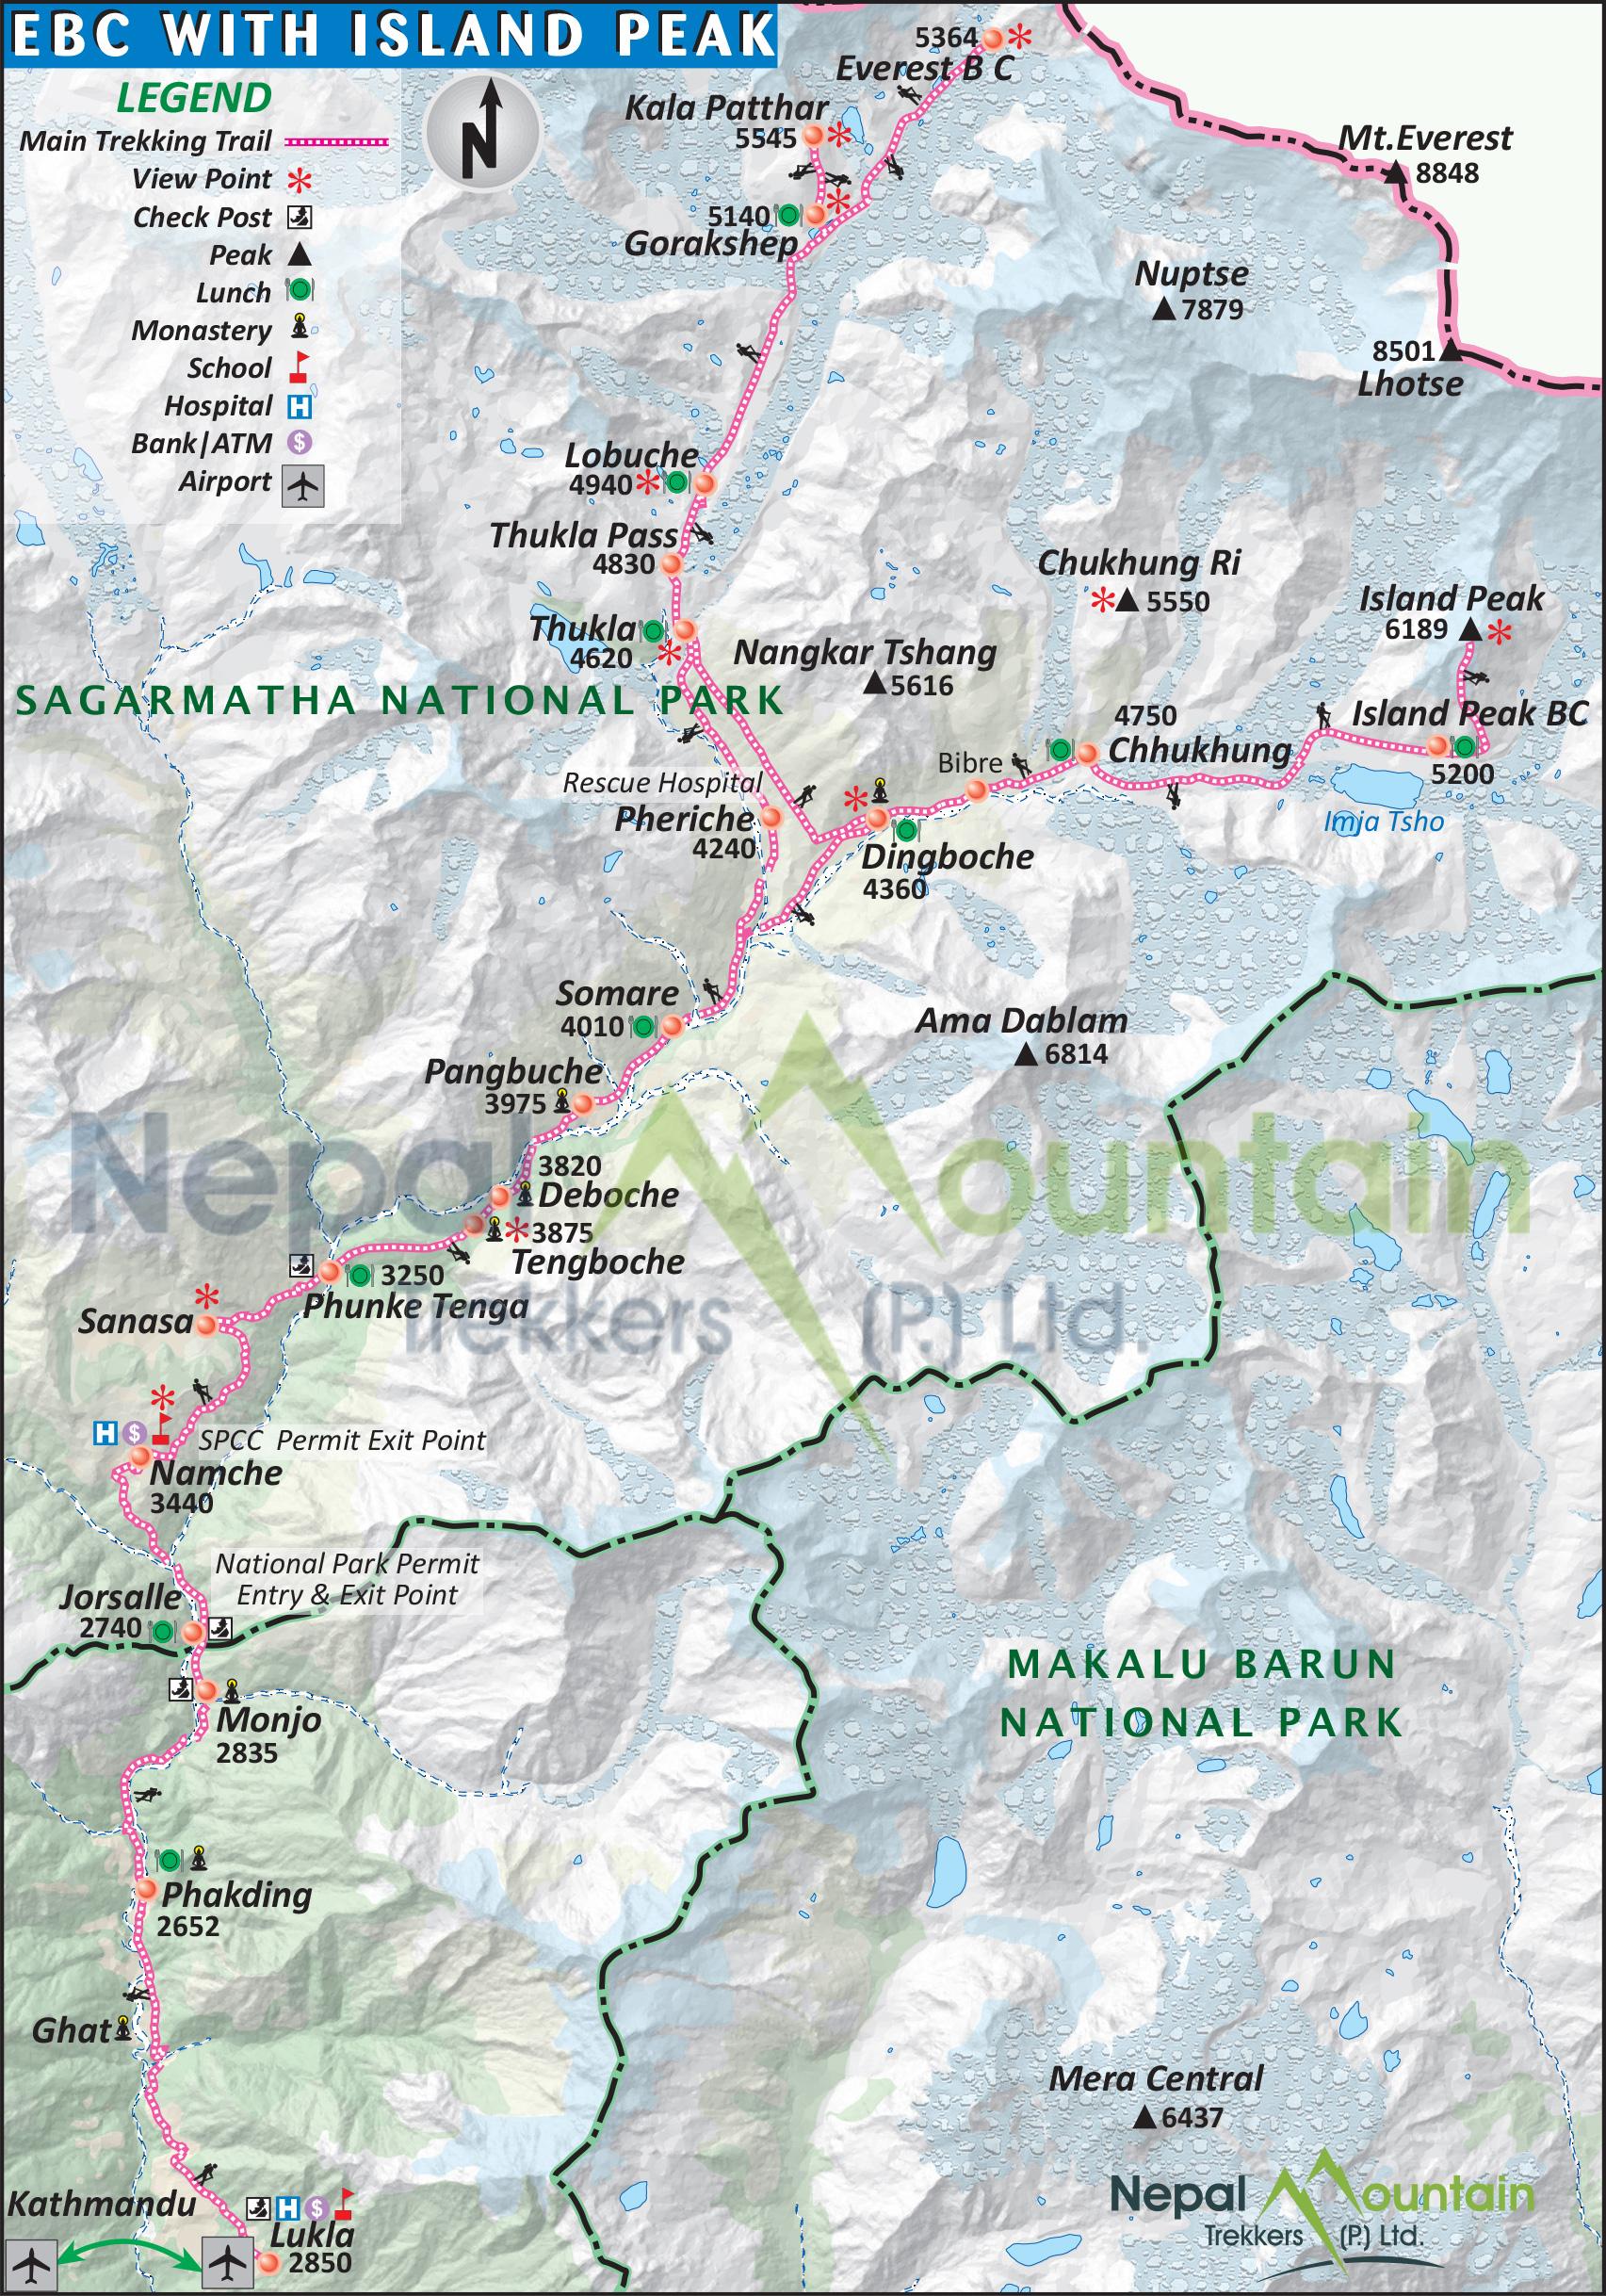 map of Everest Base Camp with Island Peak Climbing